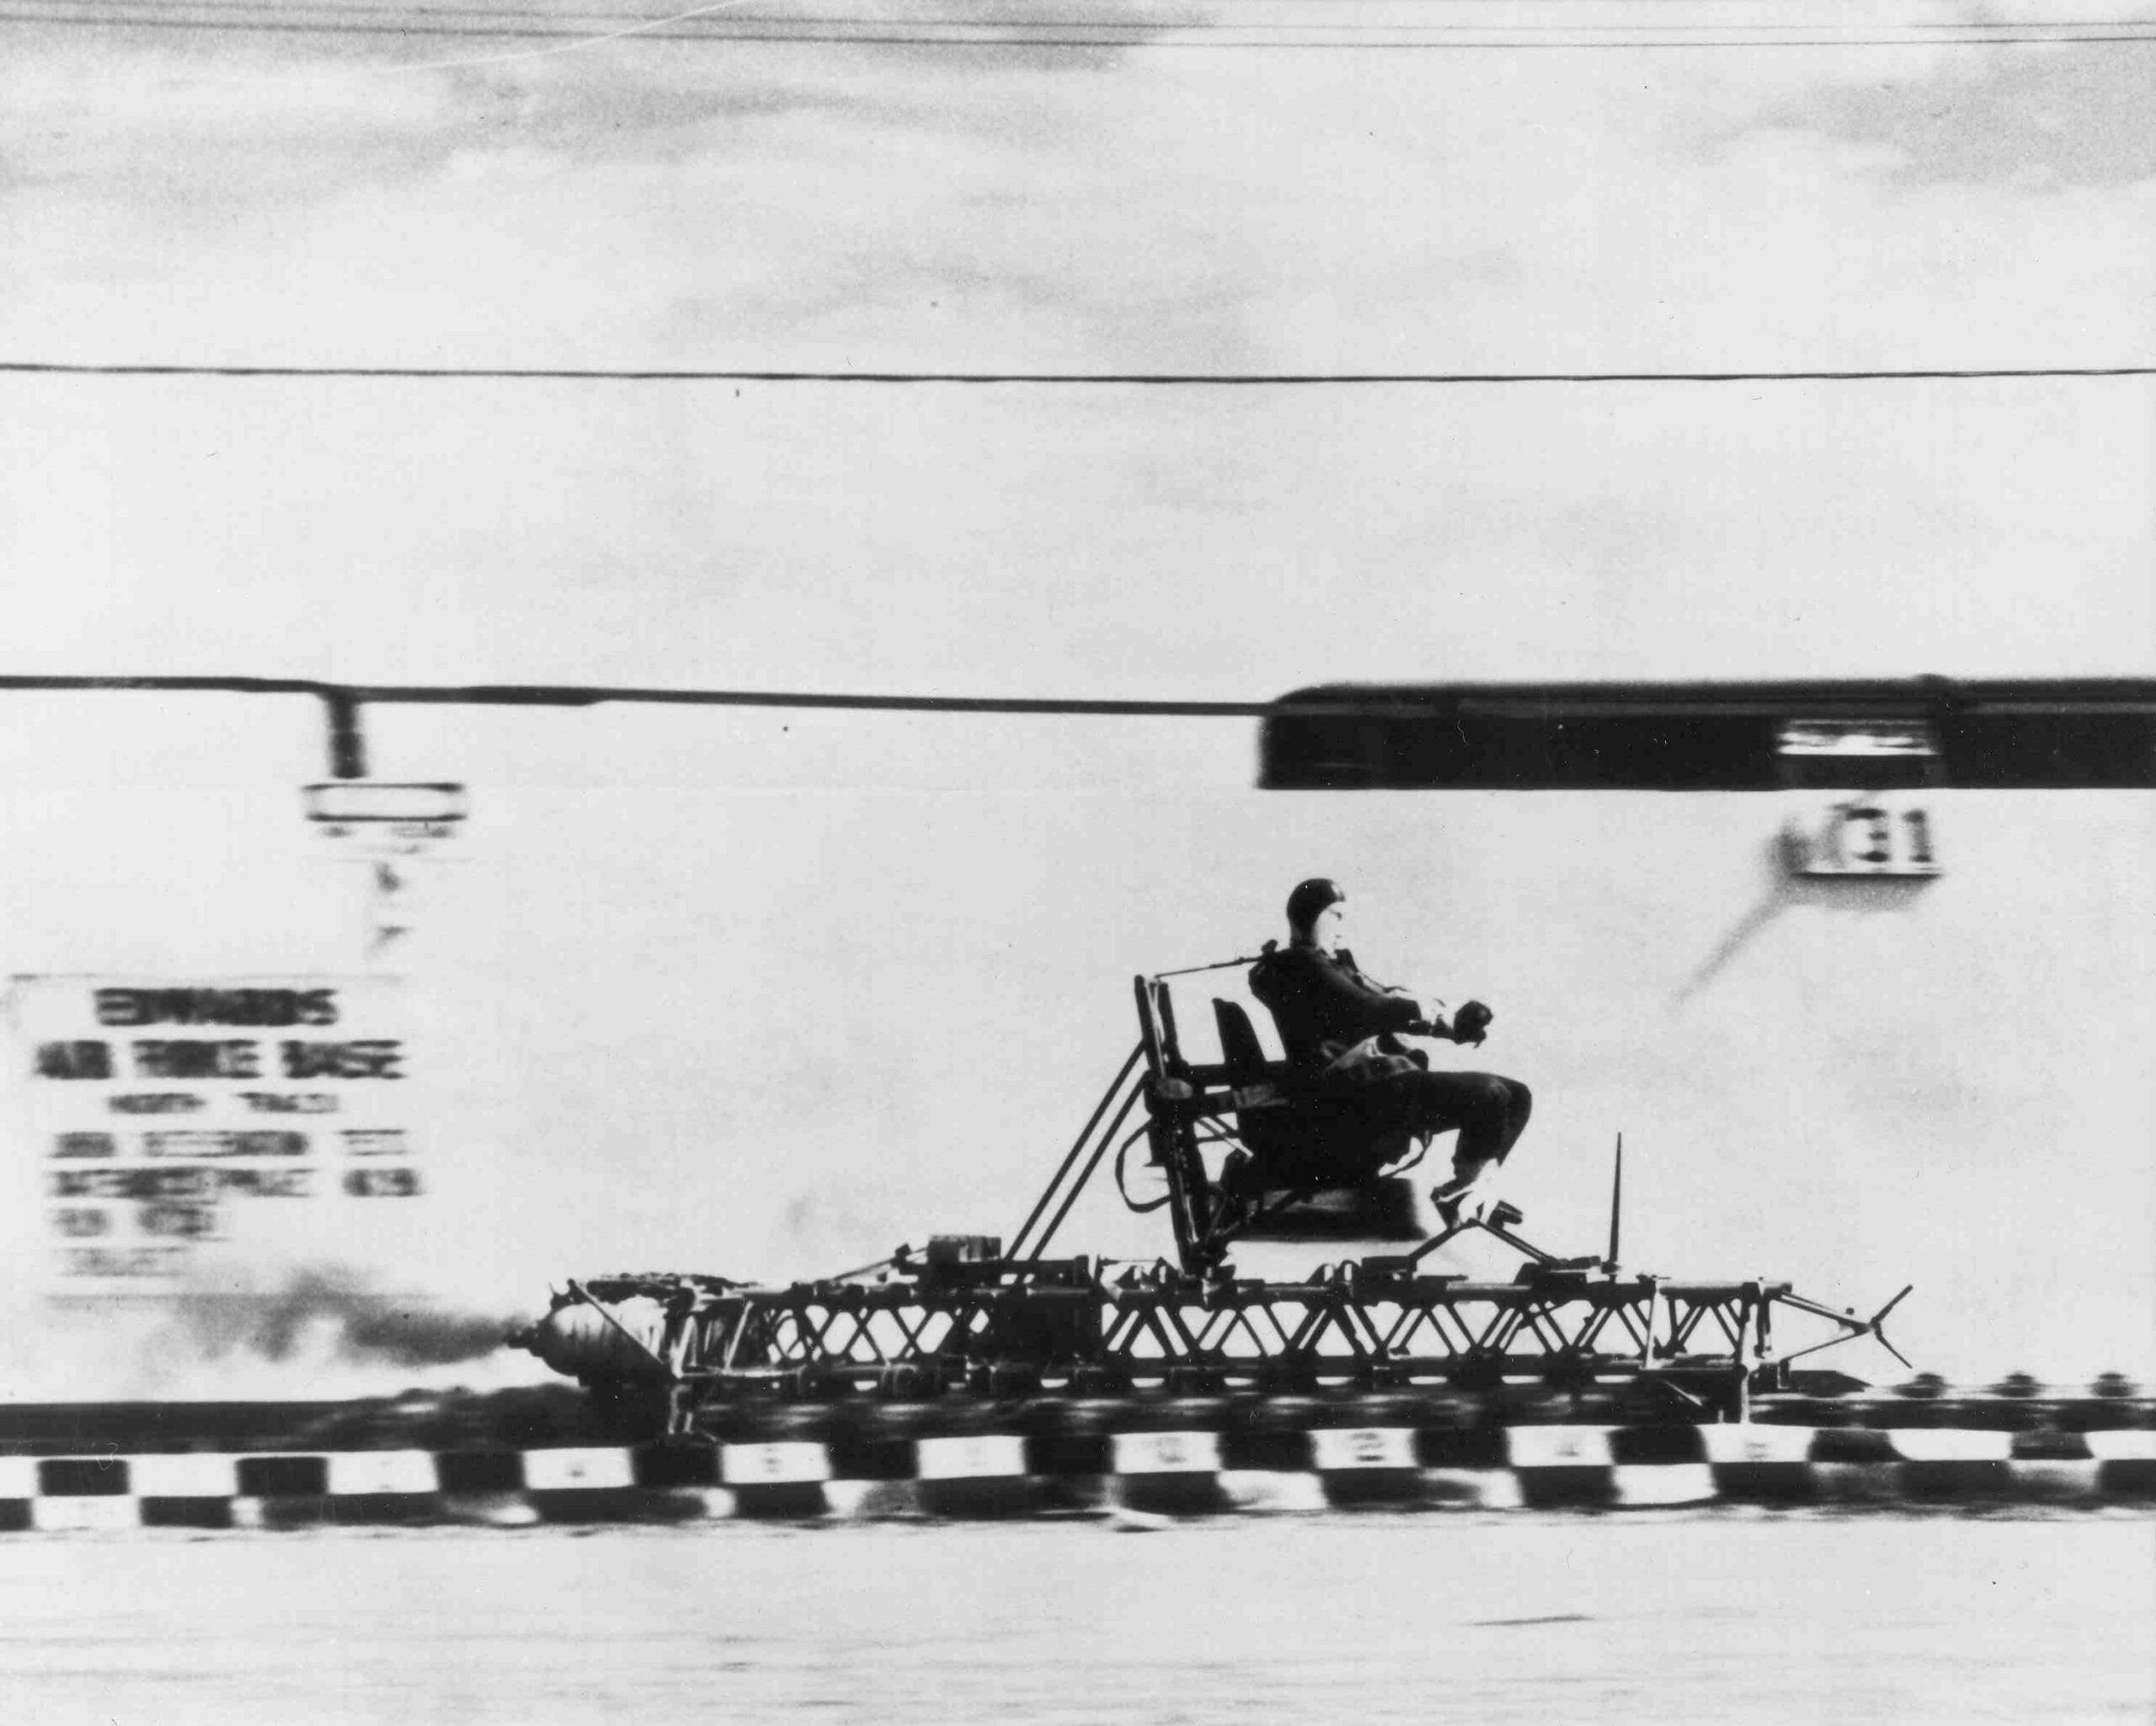 John Paul Stapp, a Real Life Rocket (Sled) Man